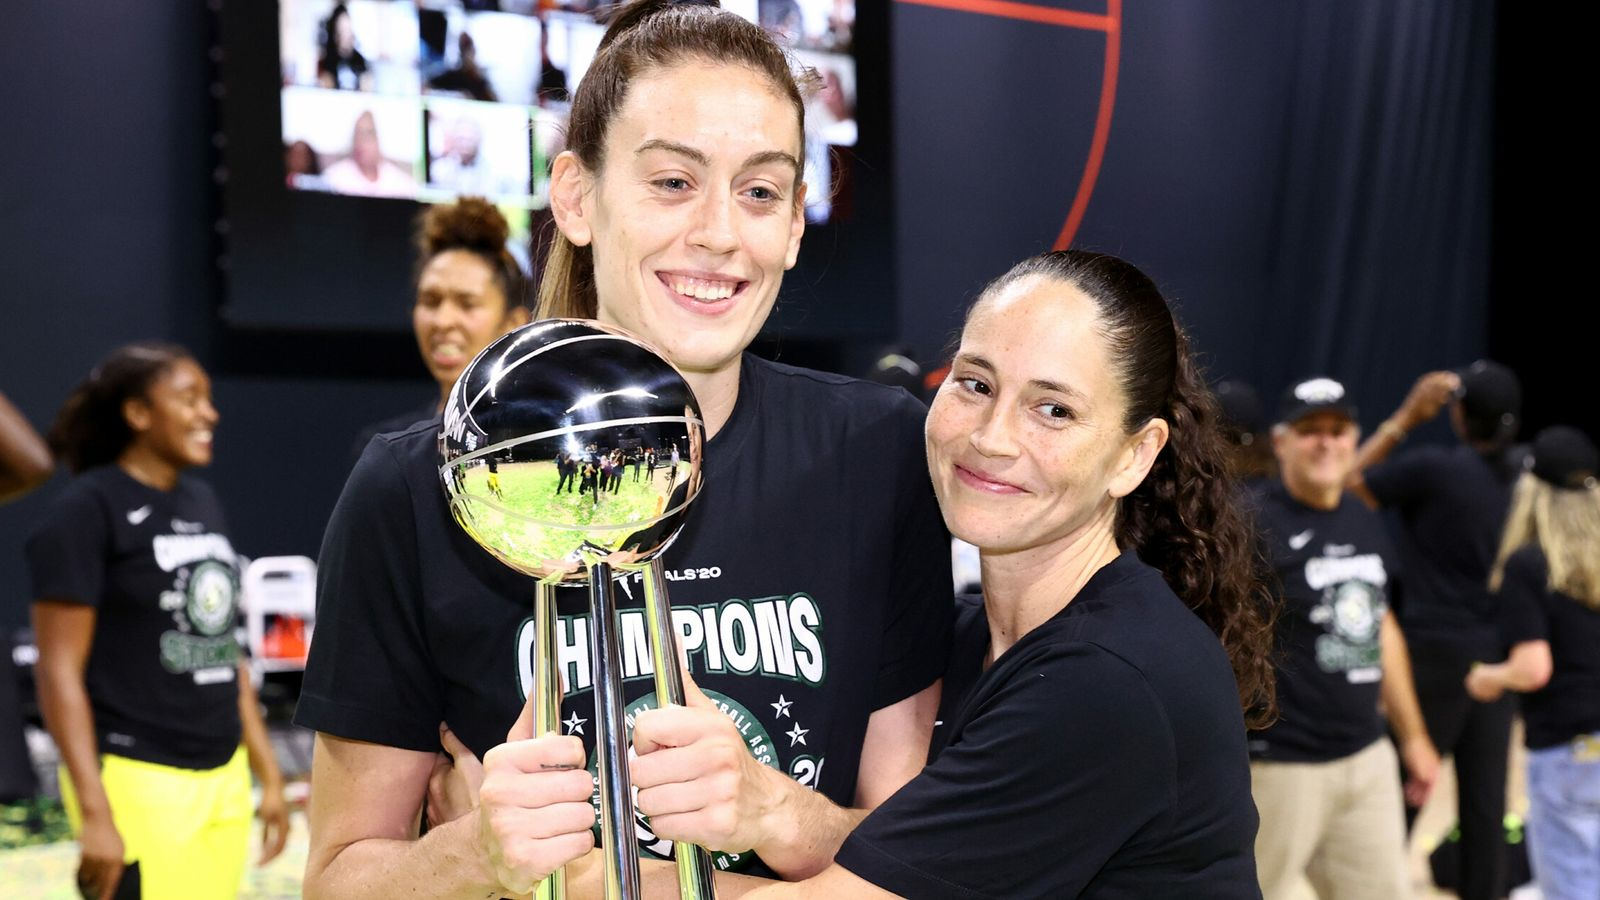 WNBA: Storylines that will shape the 2021 season